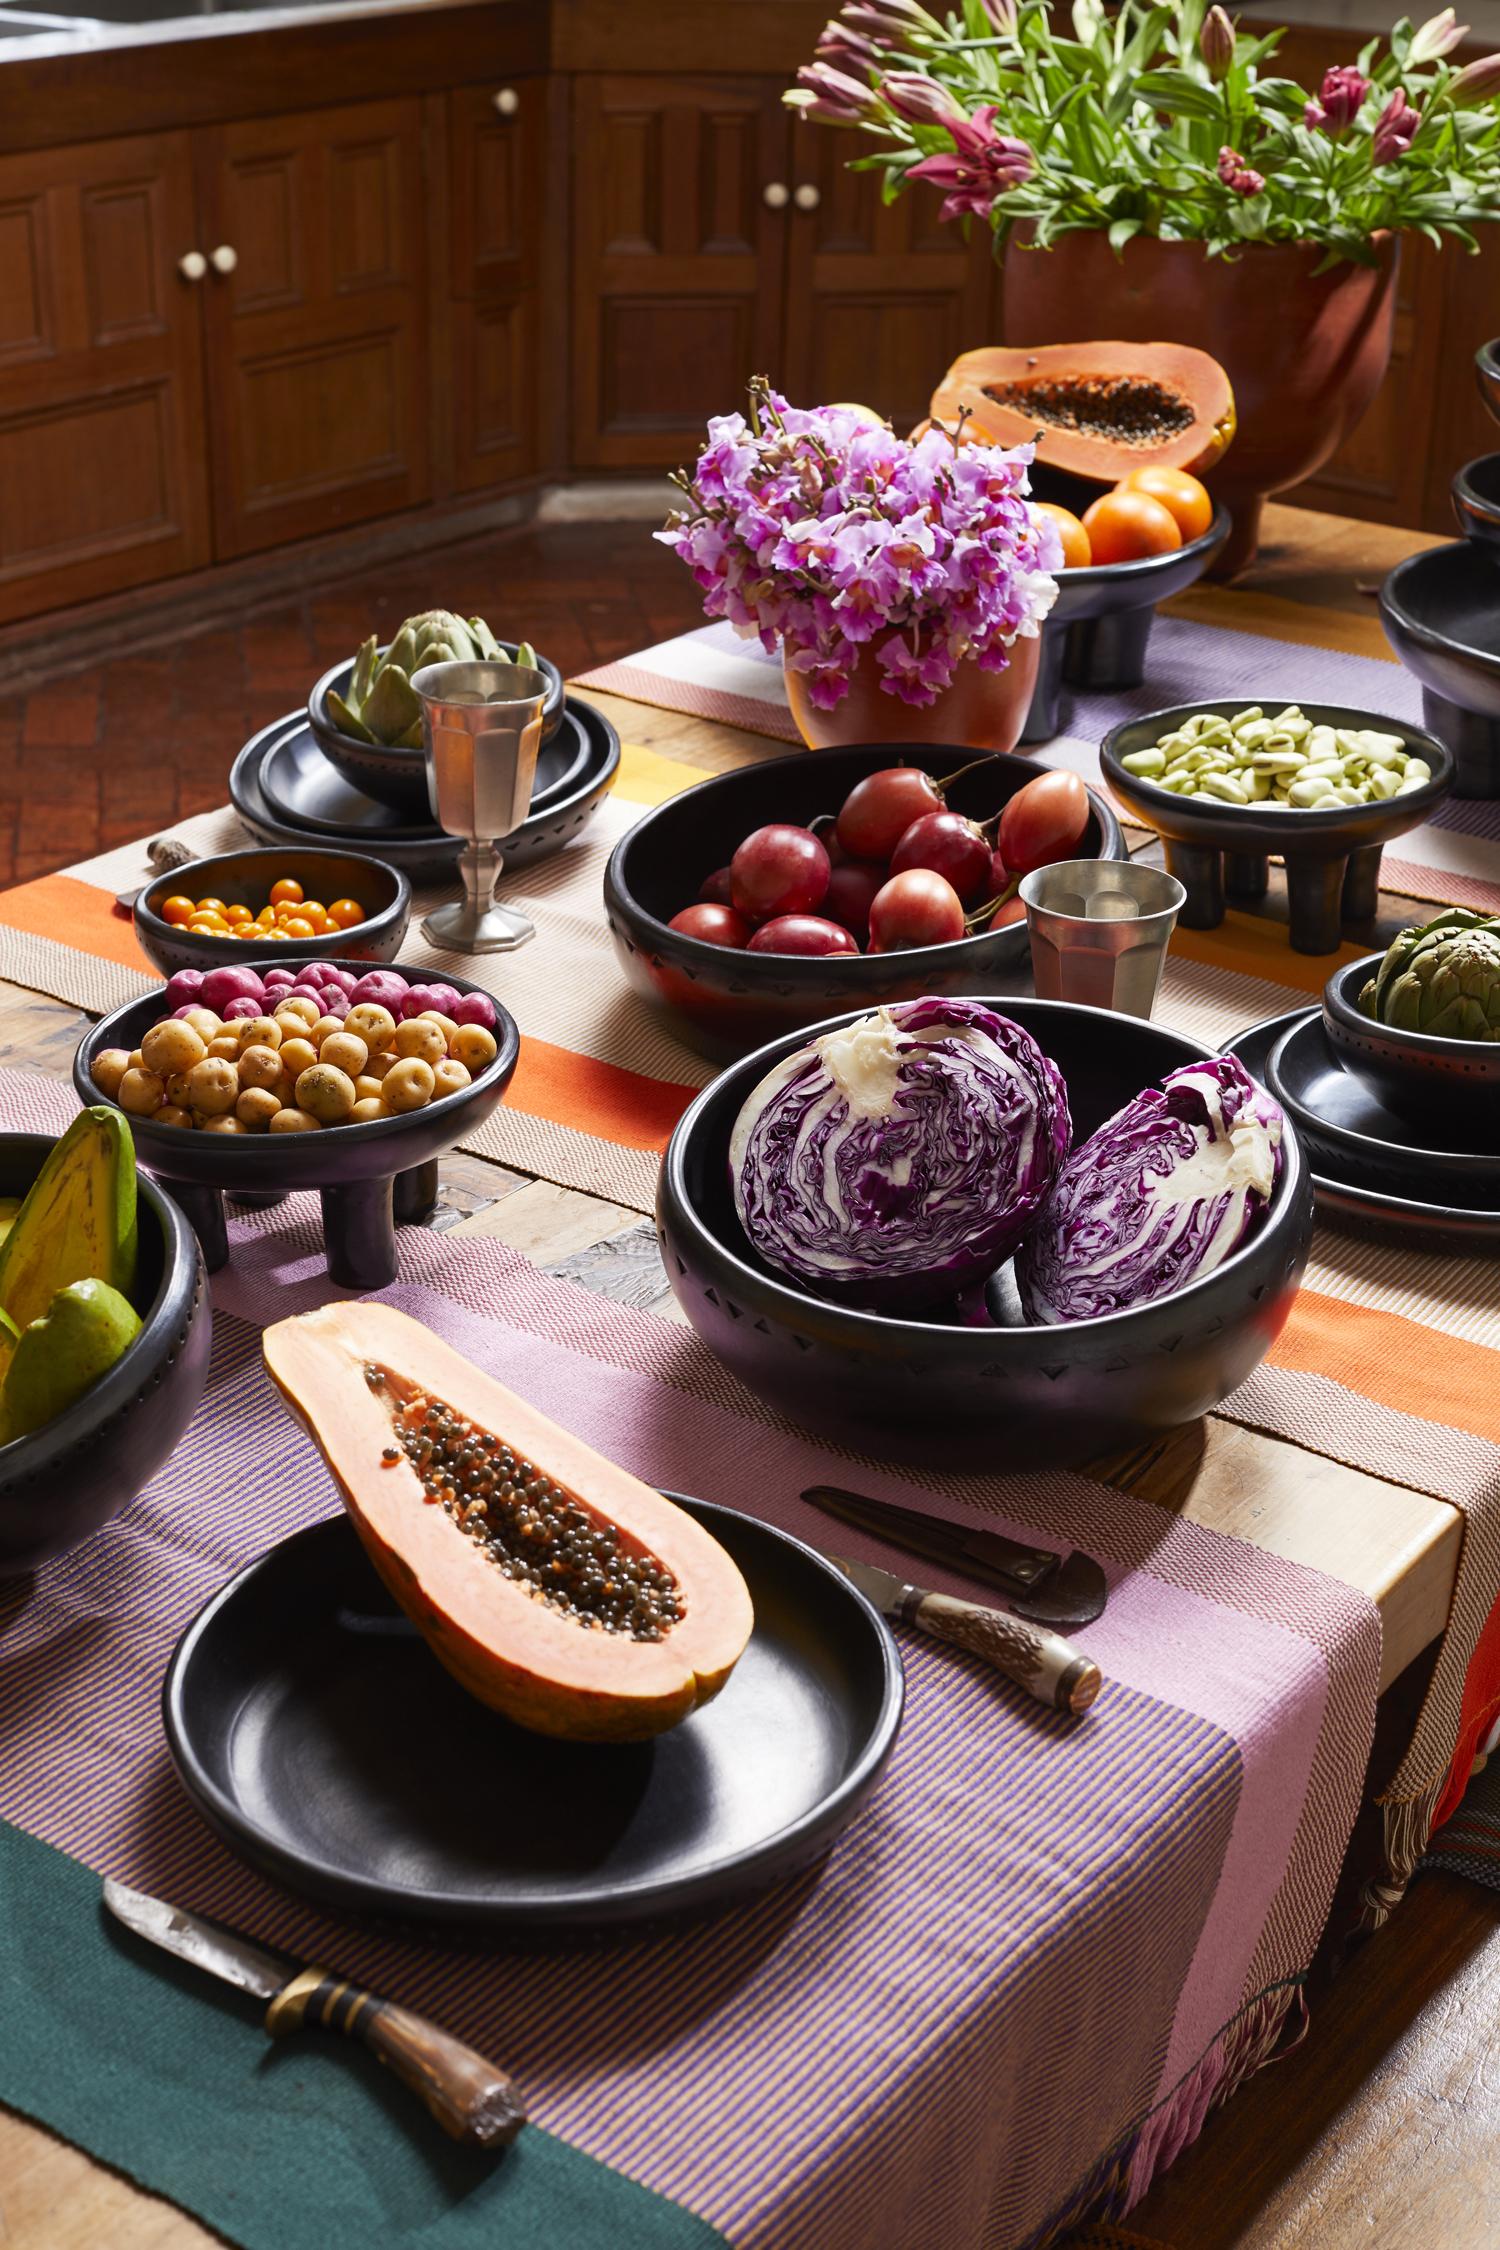 Barro Dining - Plate